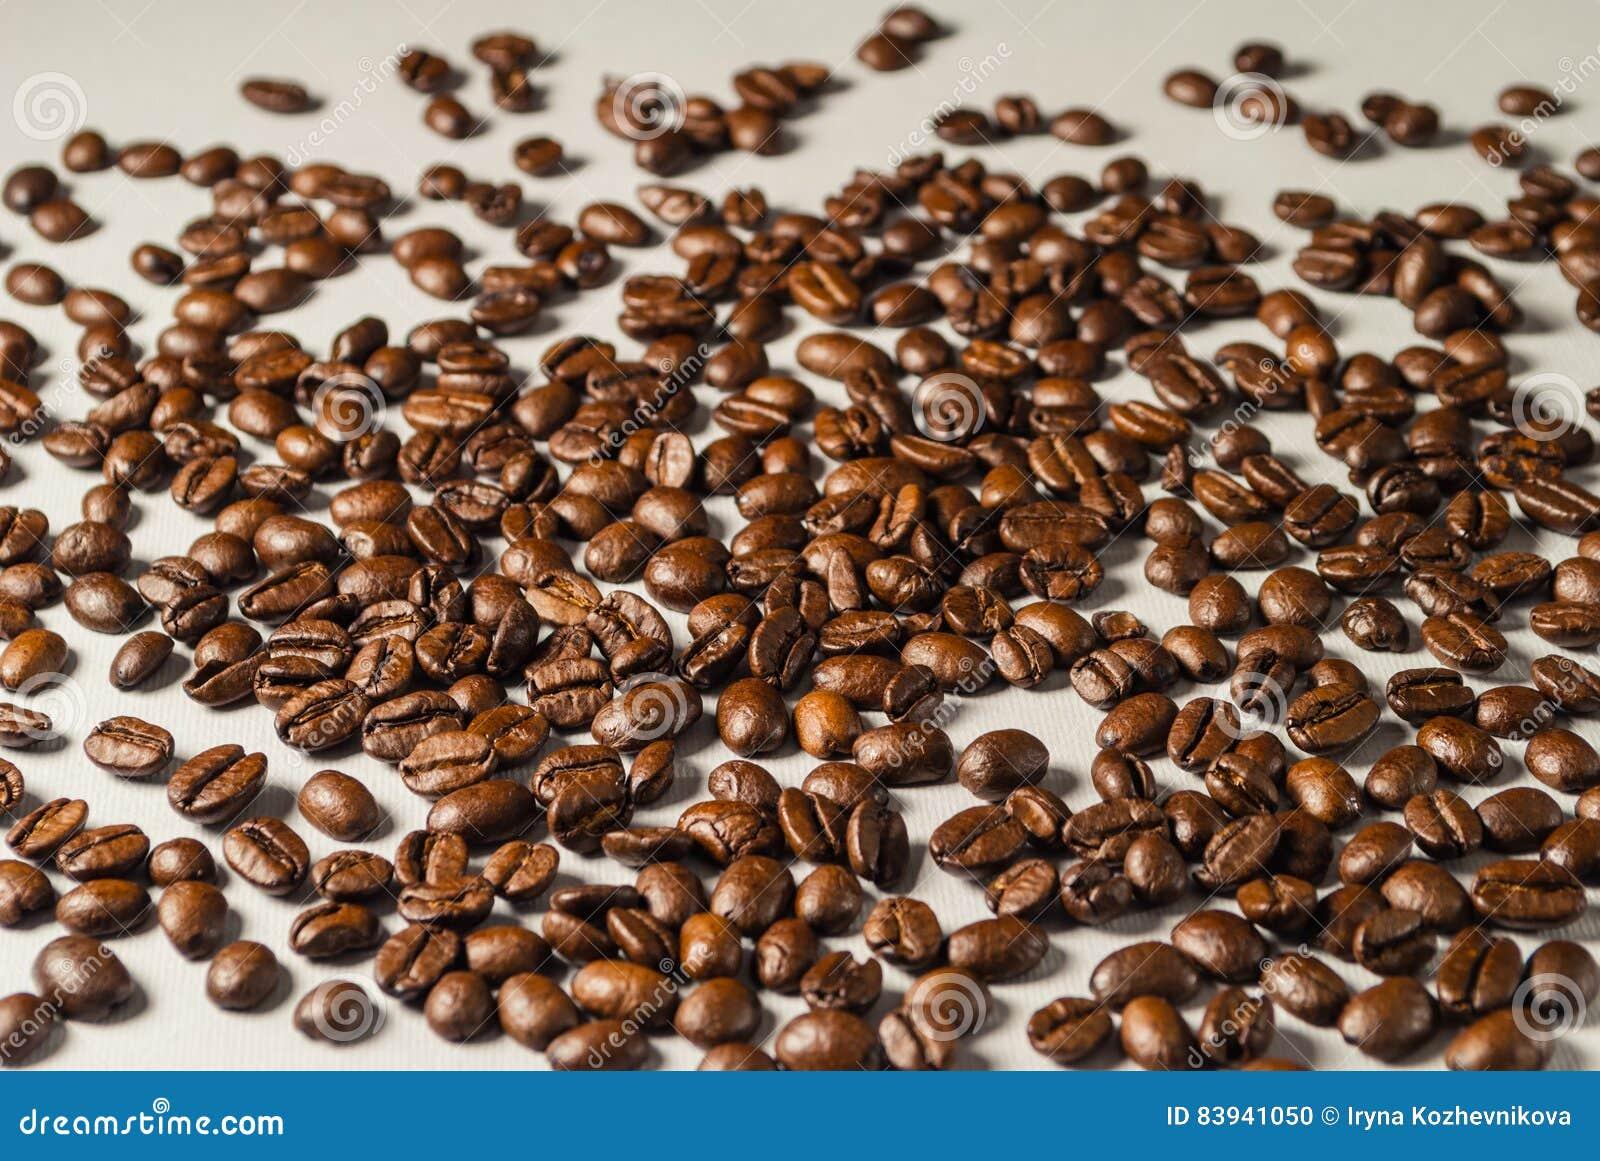 Coffebeans στο ουδέτερο γκρίζο υπόβαθρο σκοτεινό roast καφέ